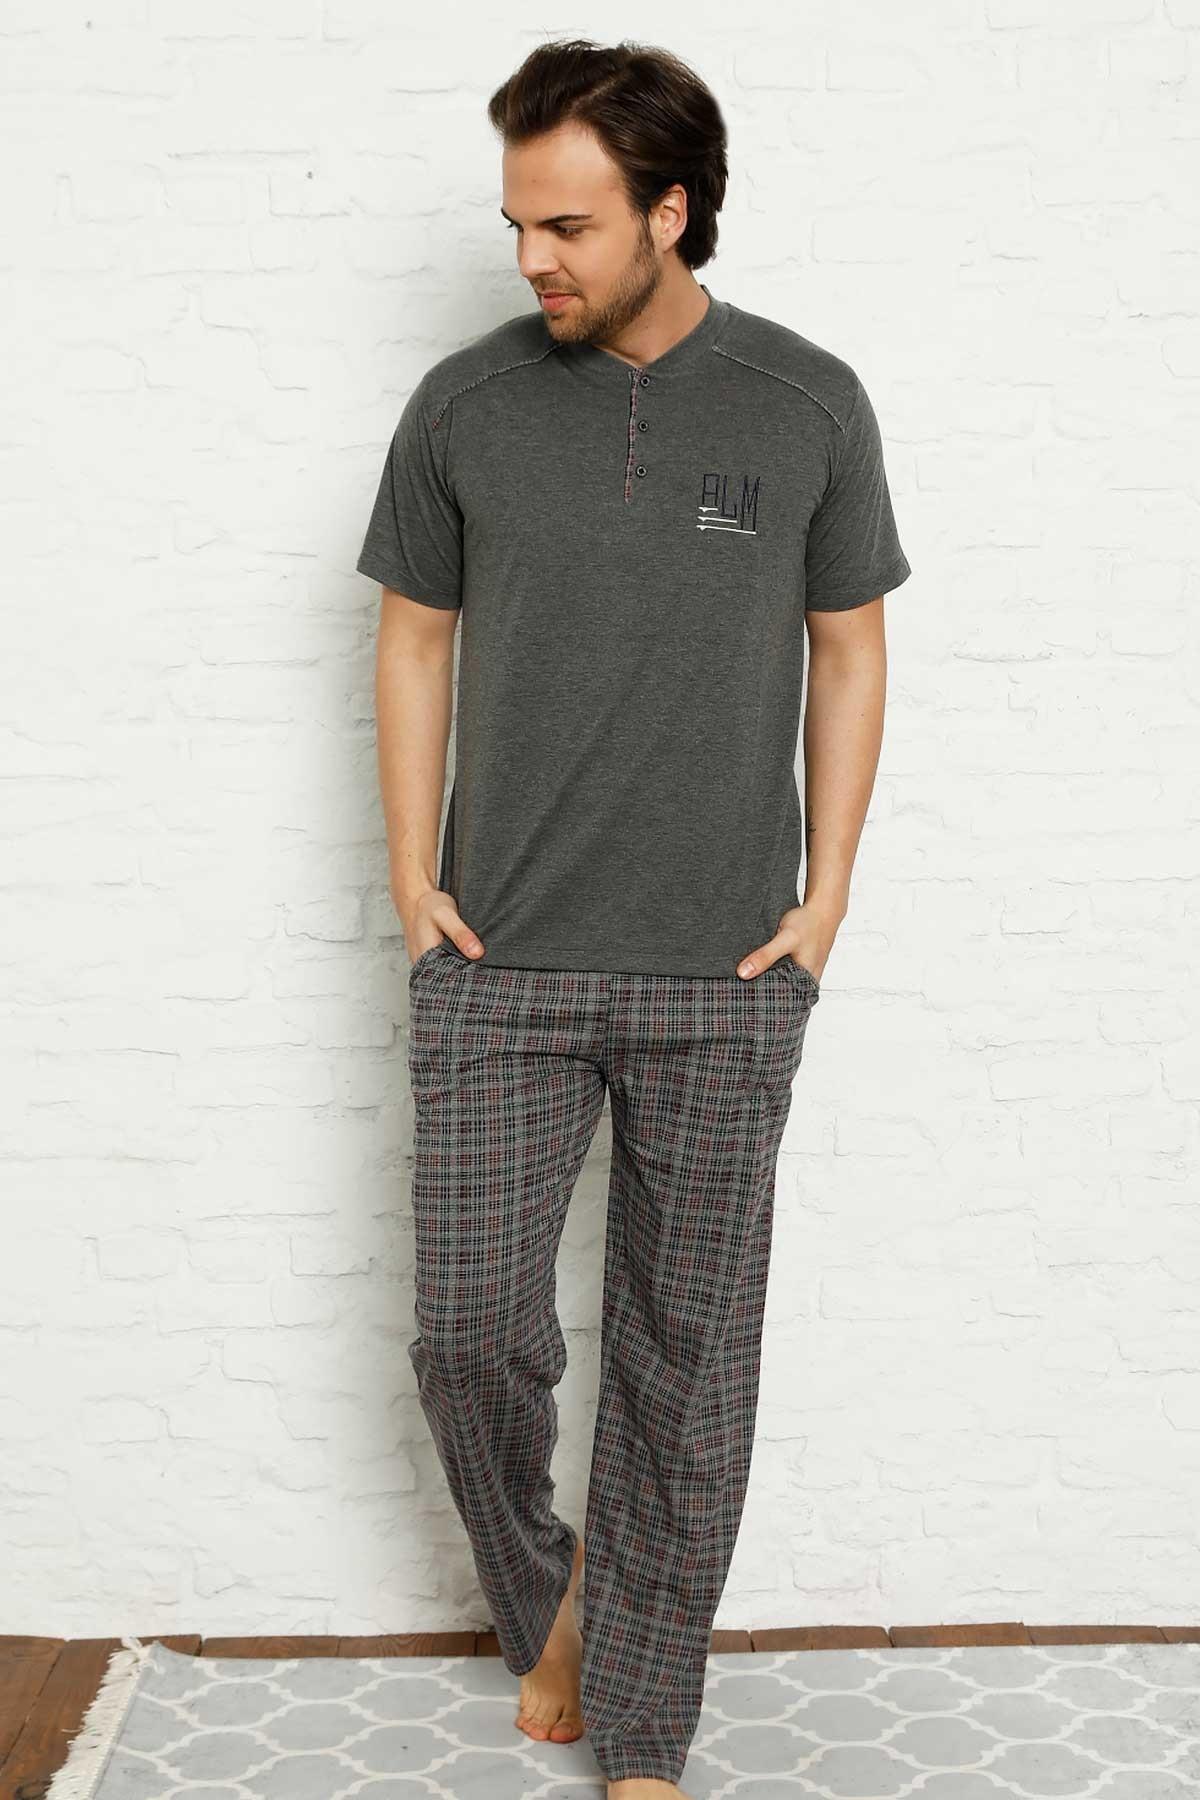 New Summer Spring Men 'S Pajamas Sets Short Sleeve 2 Color Pockets Sleepwear Pajamas Suit Homewear Overnight Dressing Gown